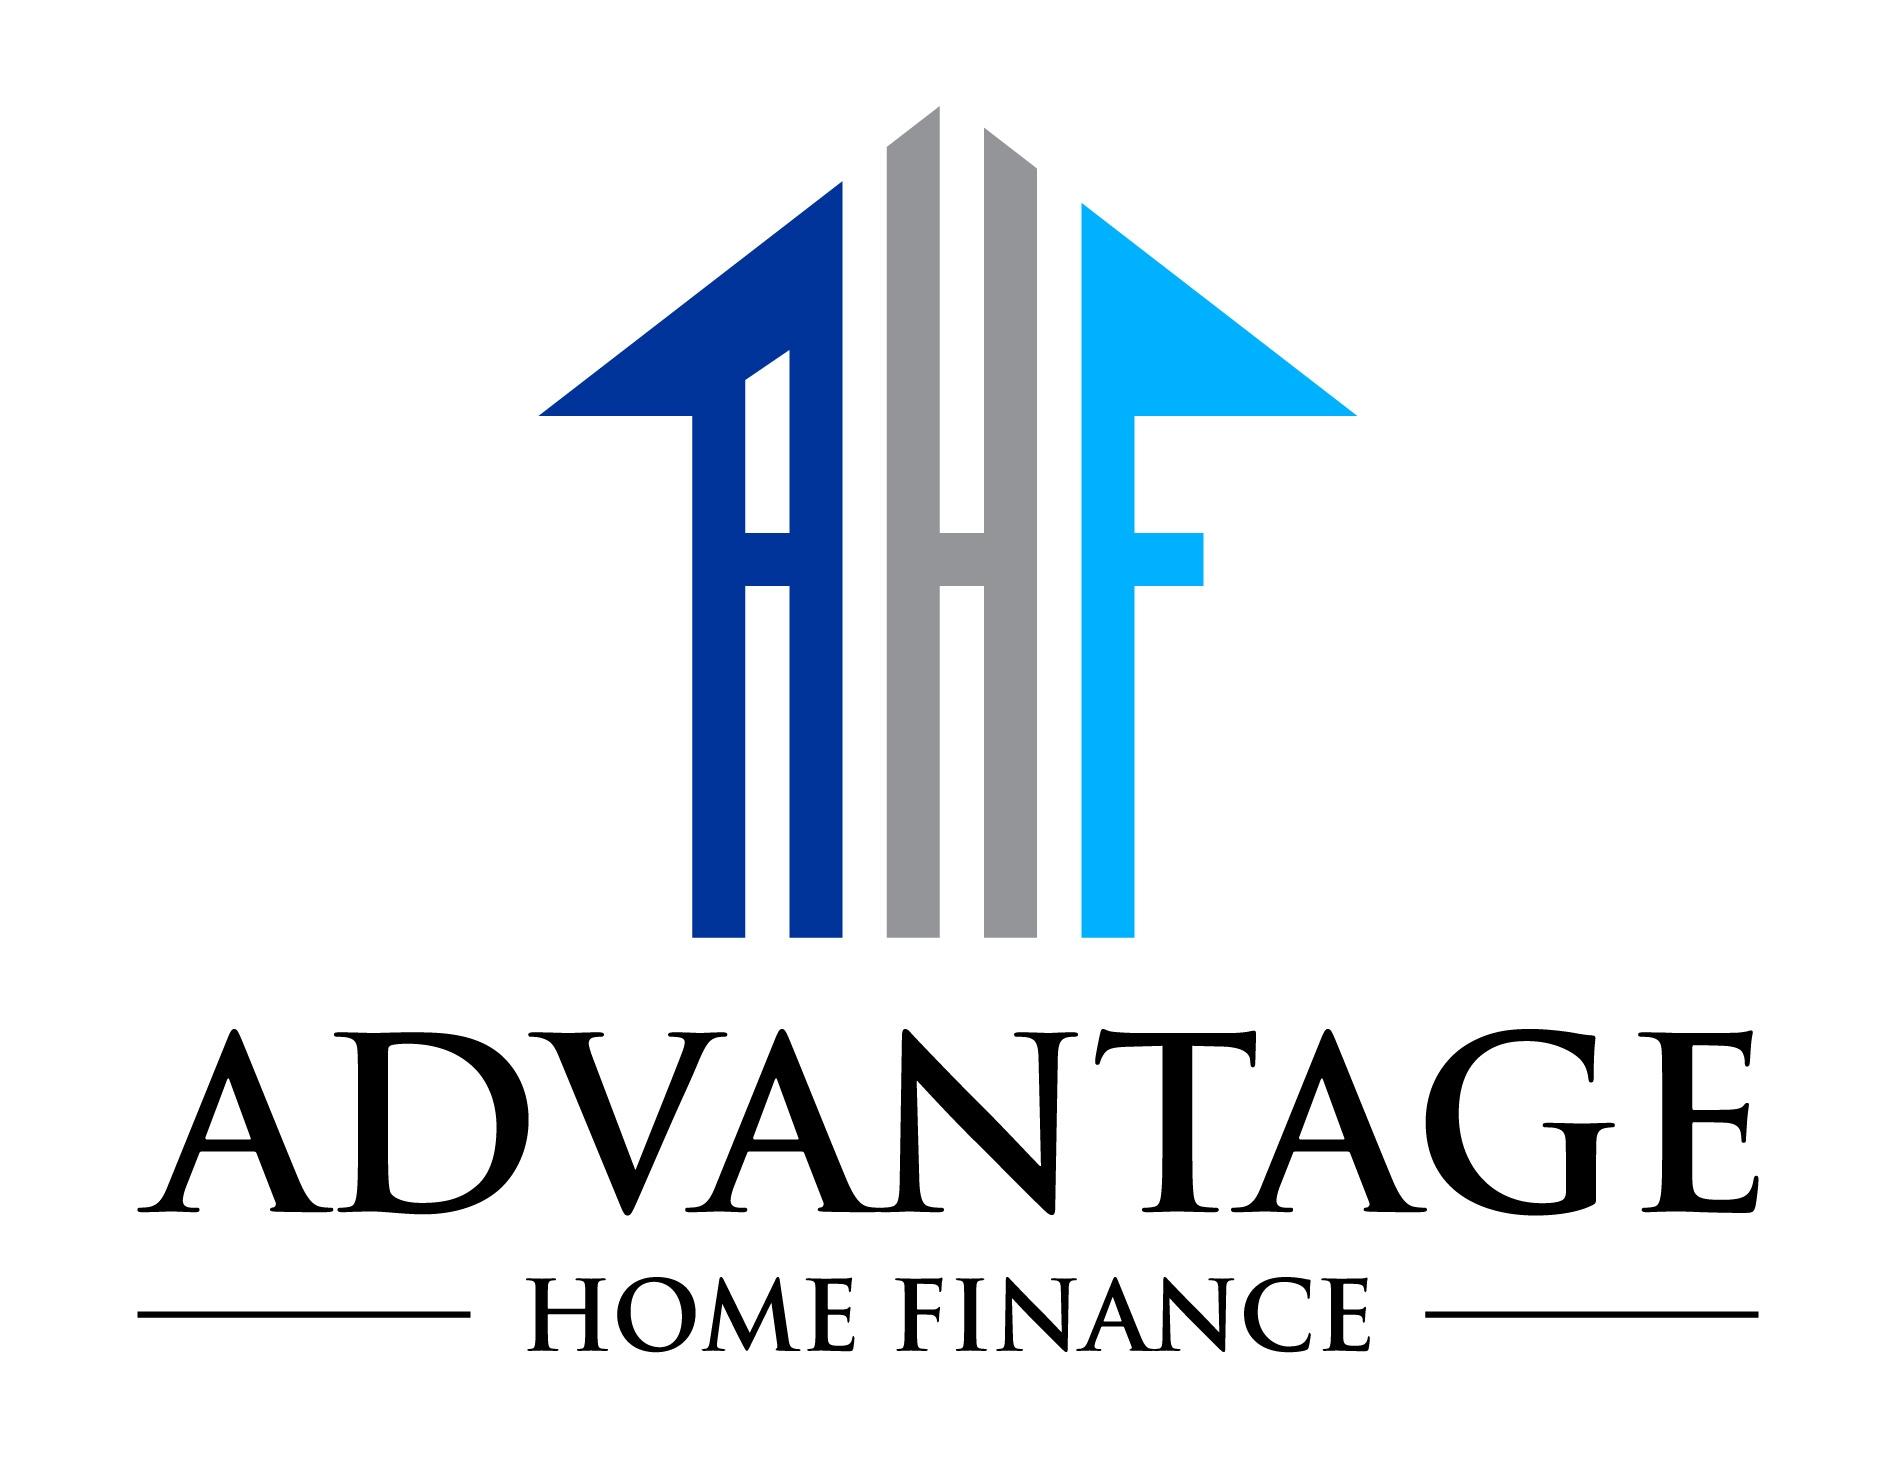 Advantage Home Finance